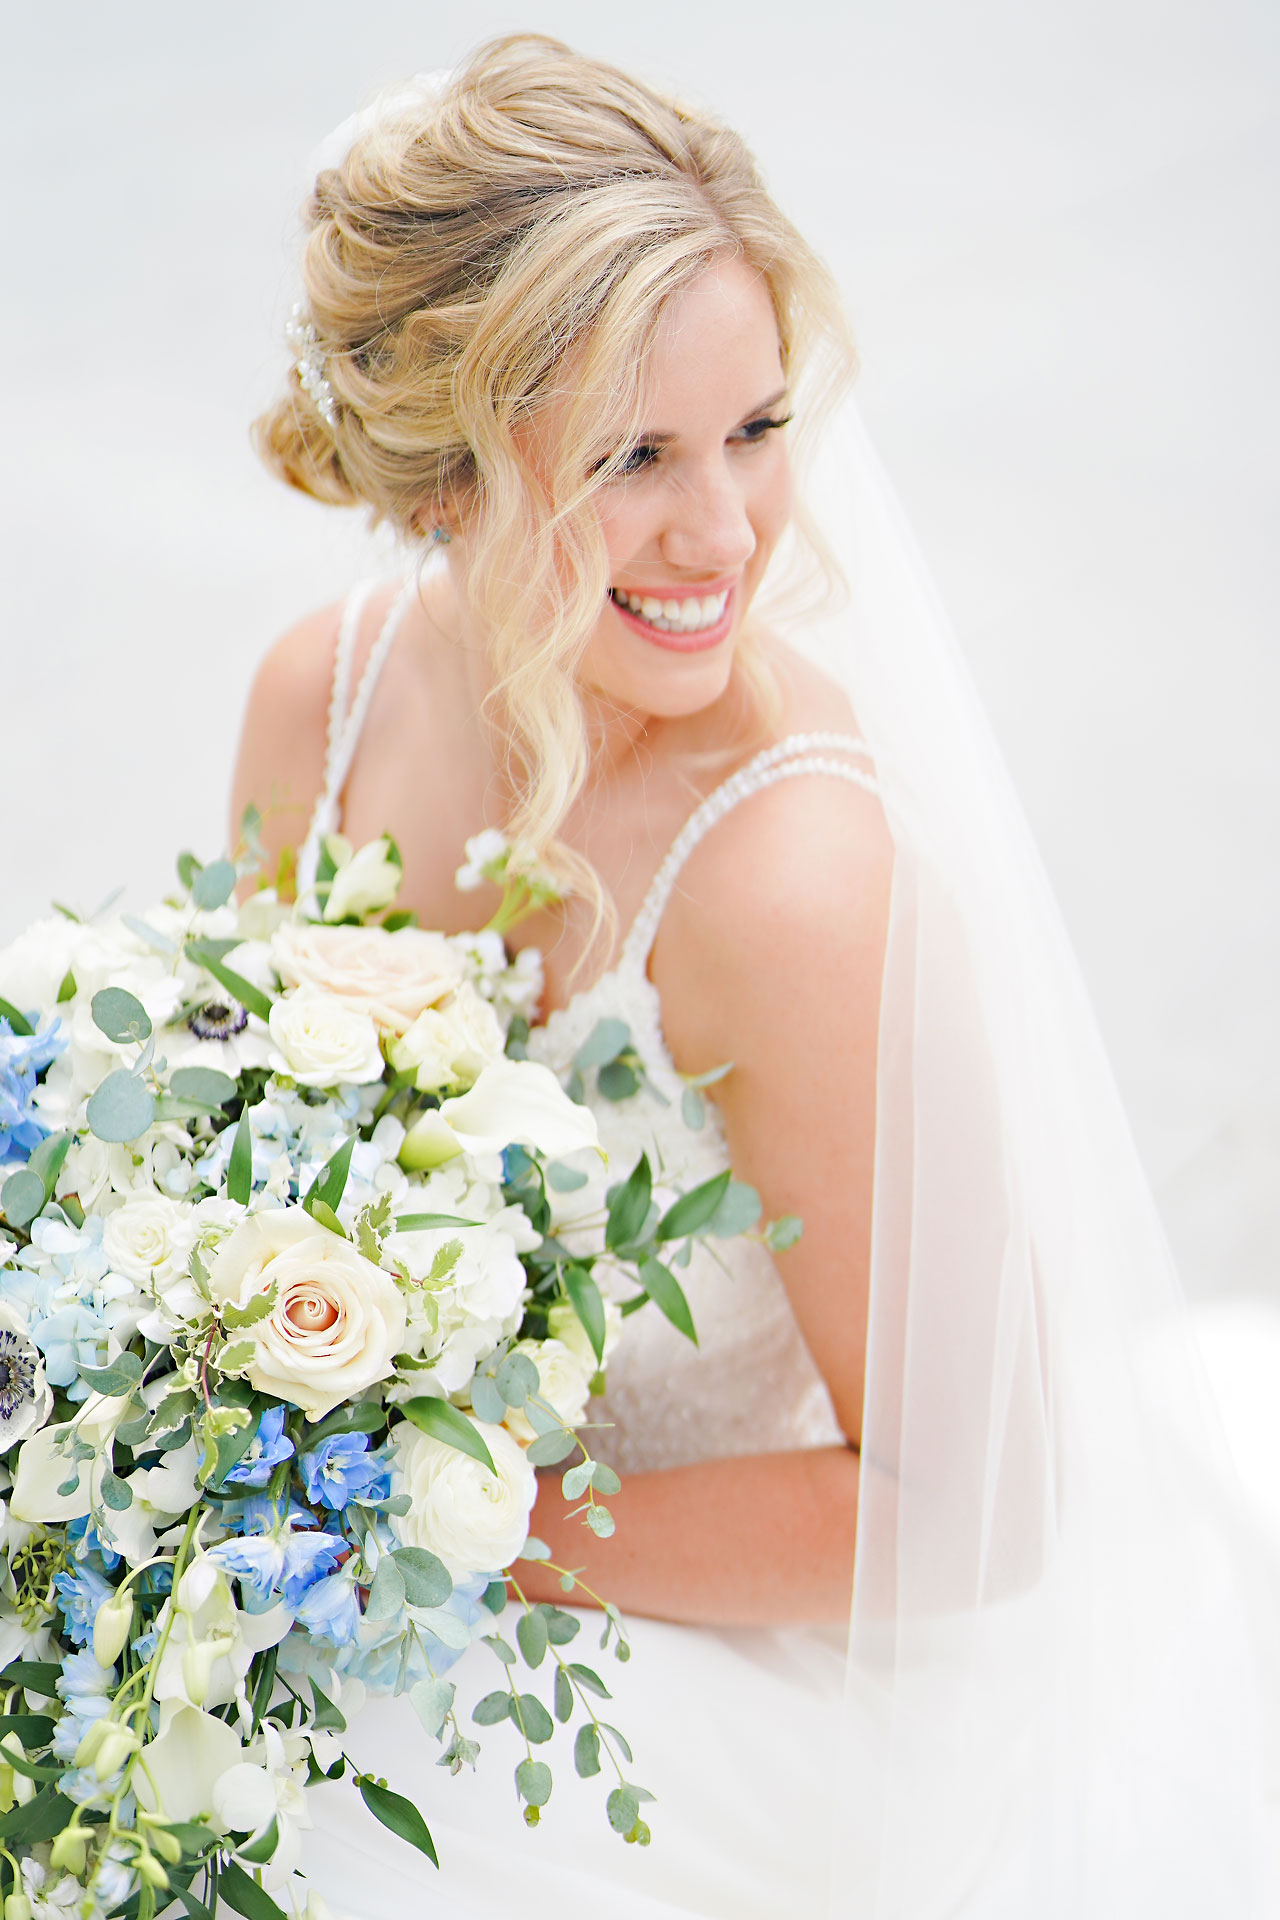 Sammi Jack Regions Tower JPS Events Indianapolis Wedding 077